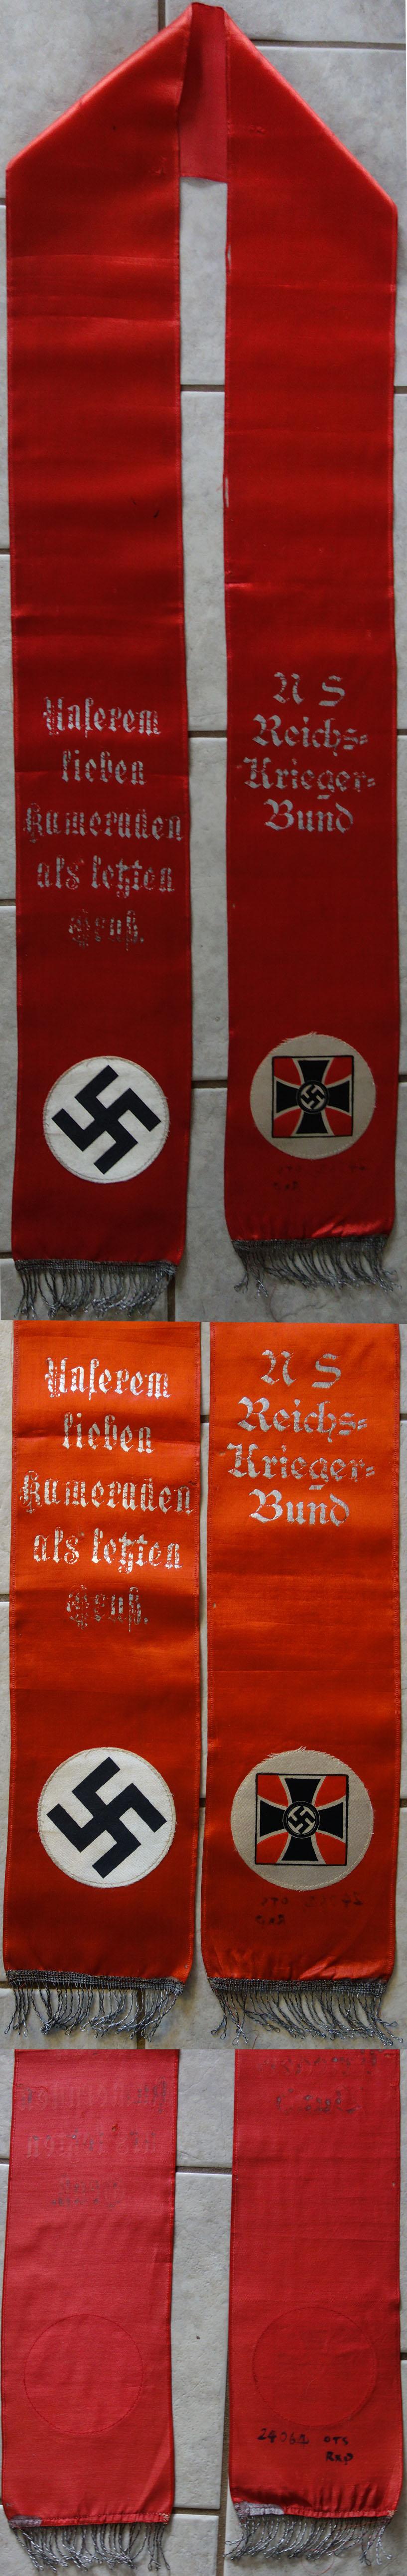 NSDAP Funeral Sash for a Veteran